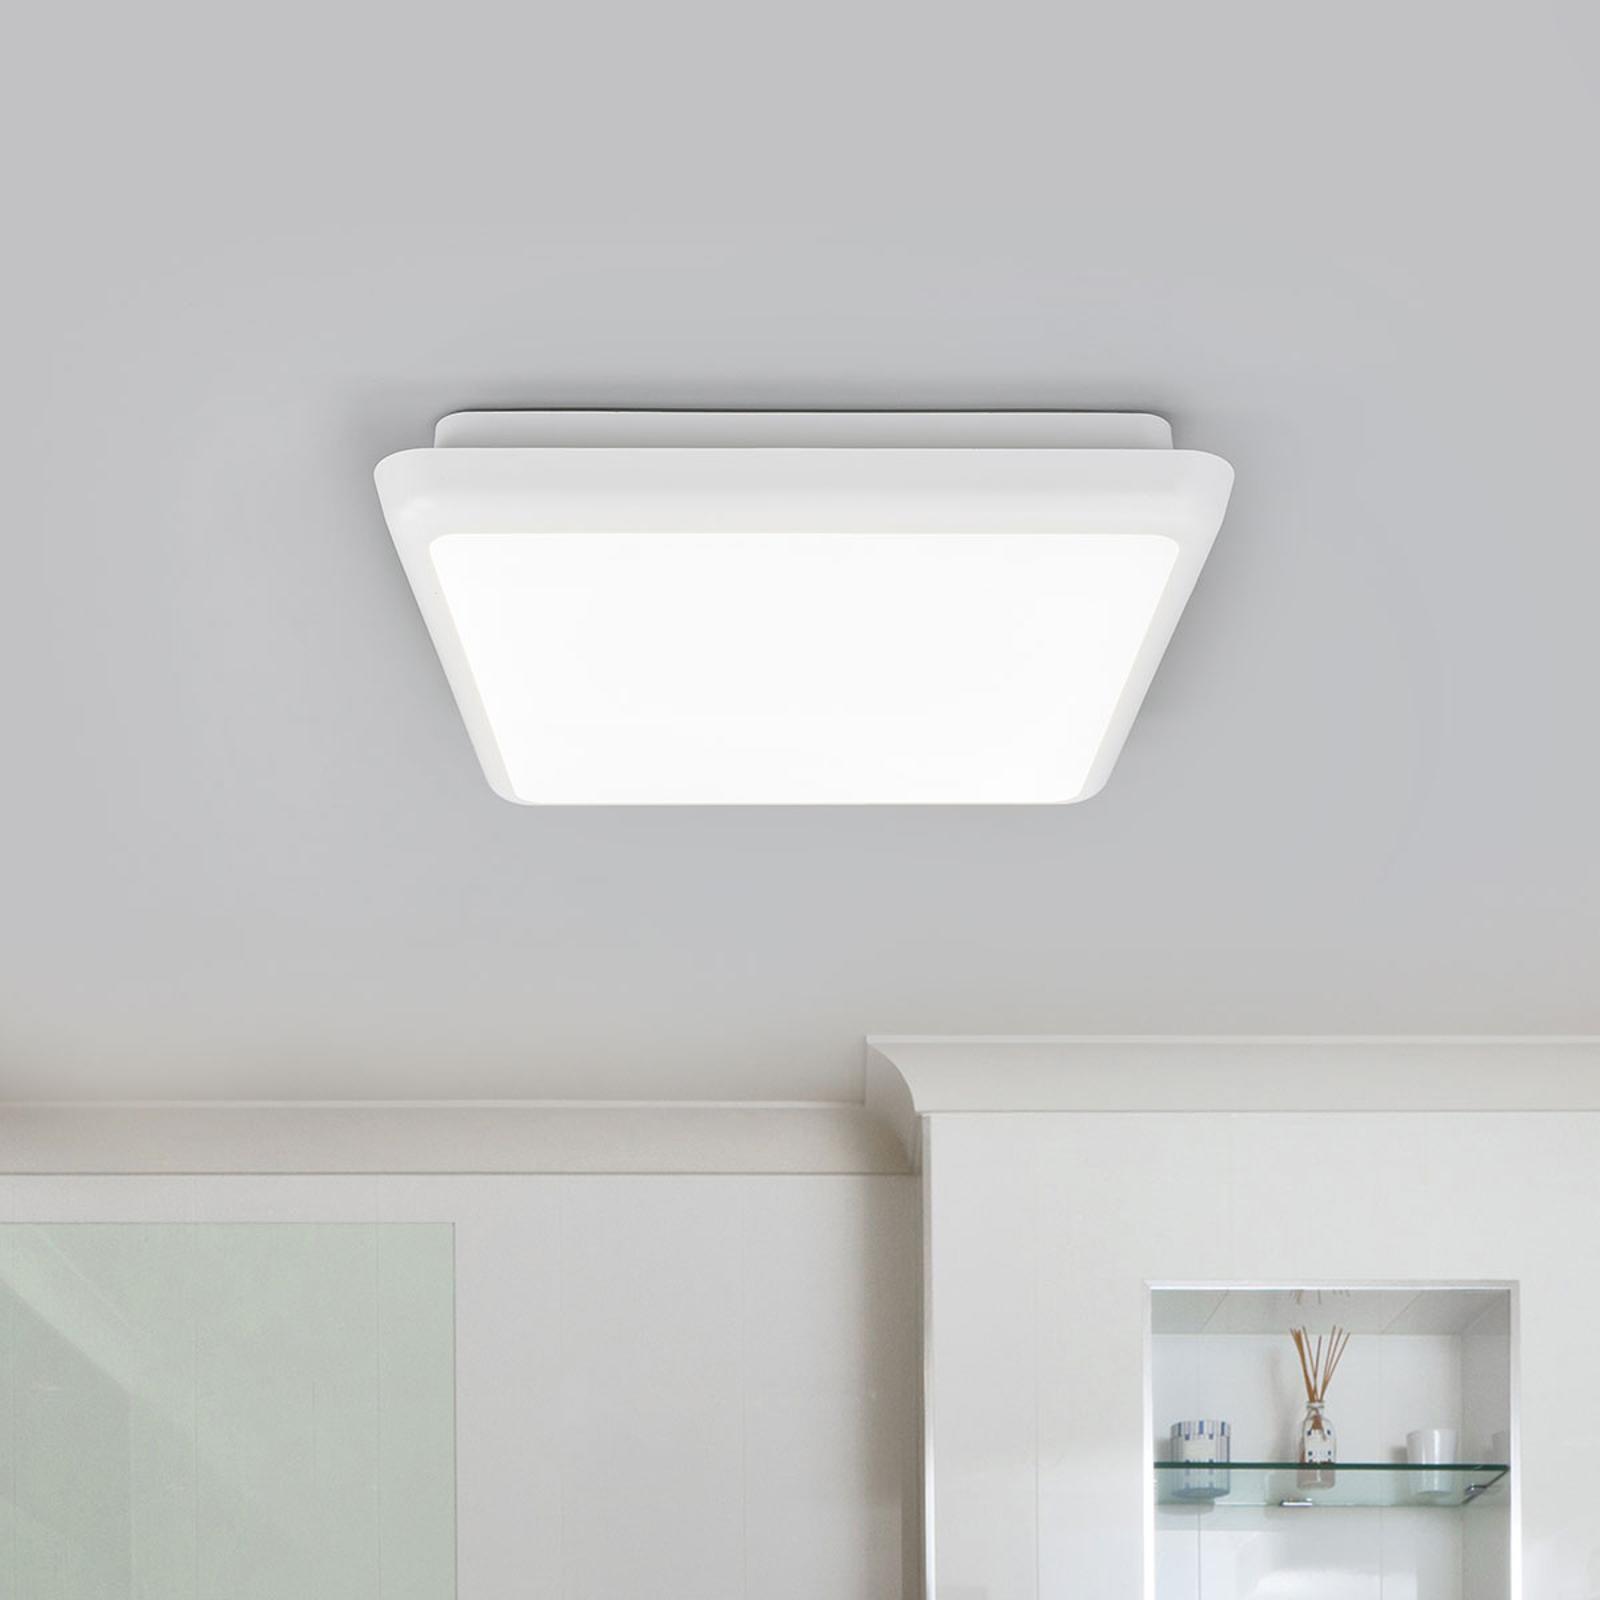 Square LED ceiling lamp Augustin, 25cm_9967010_1